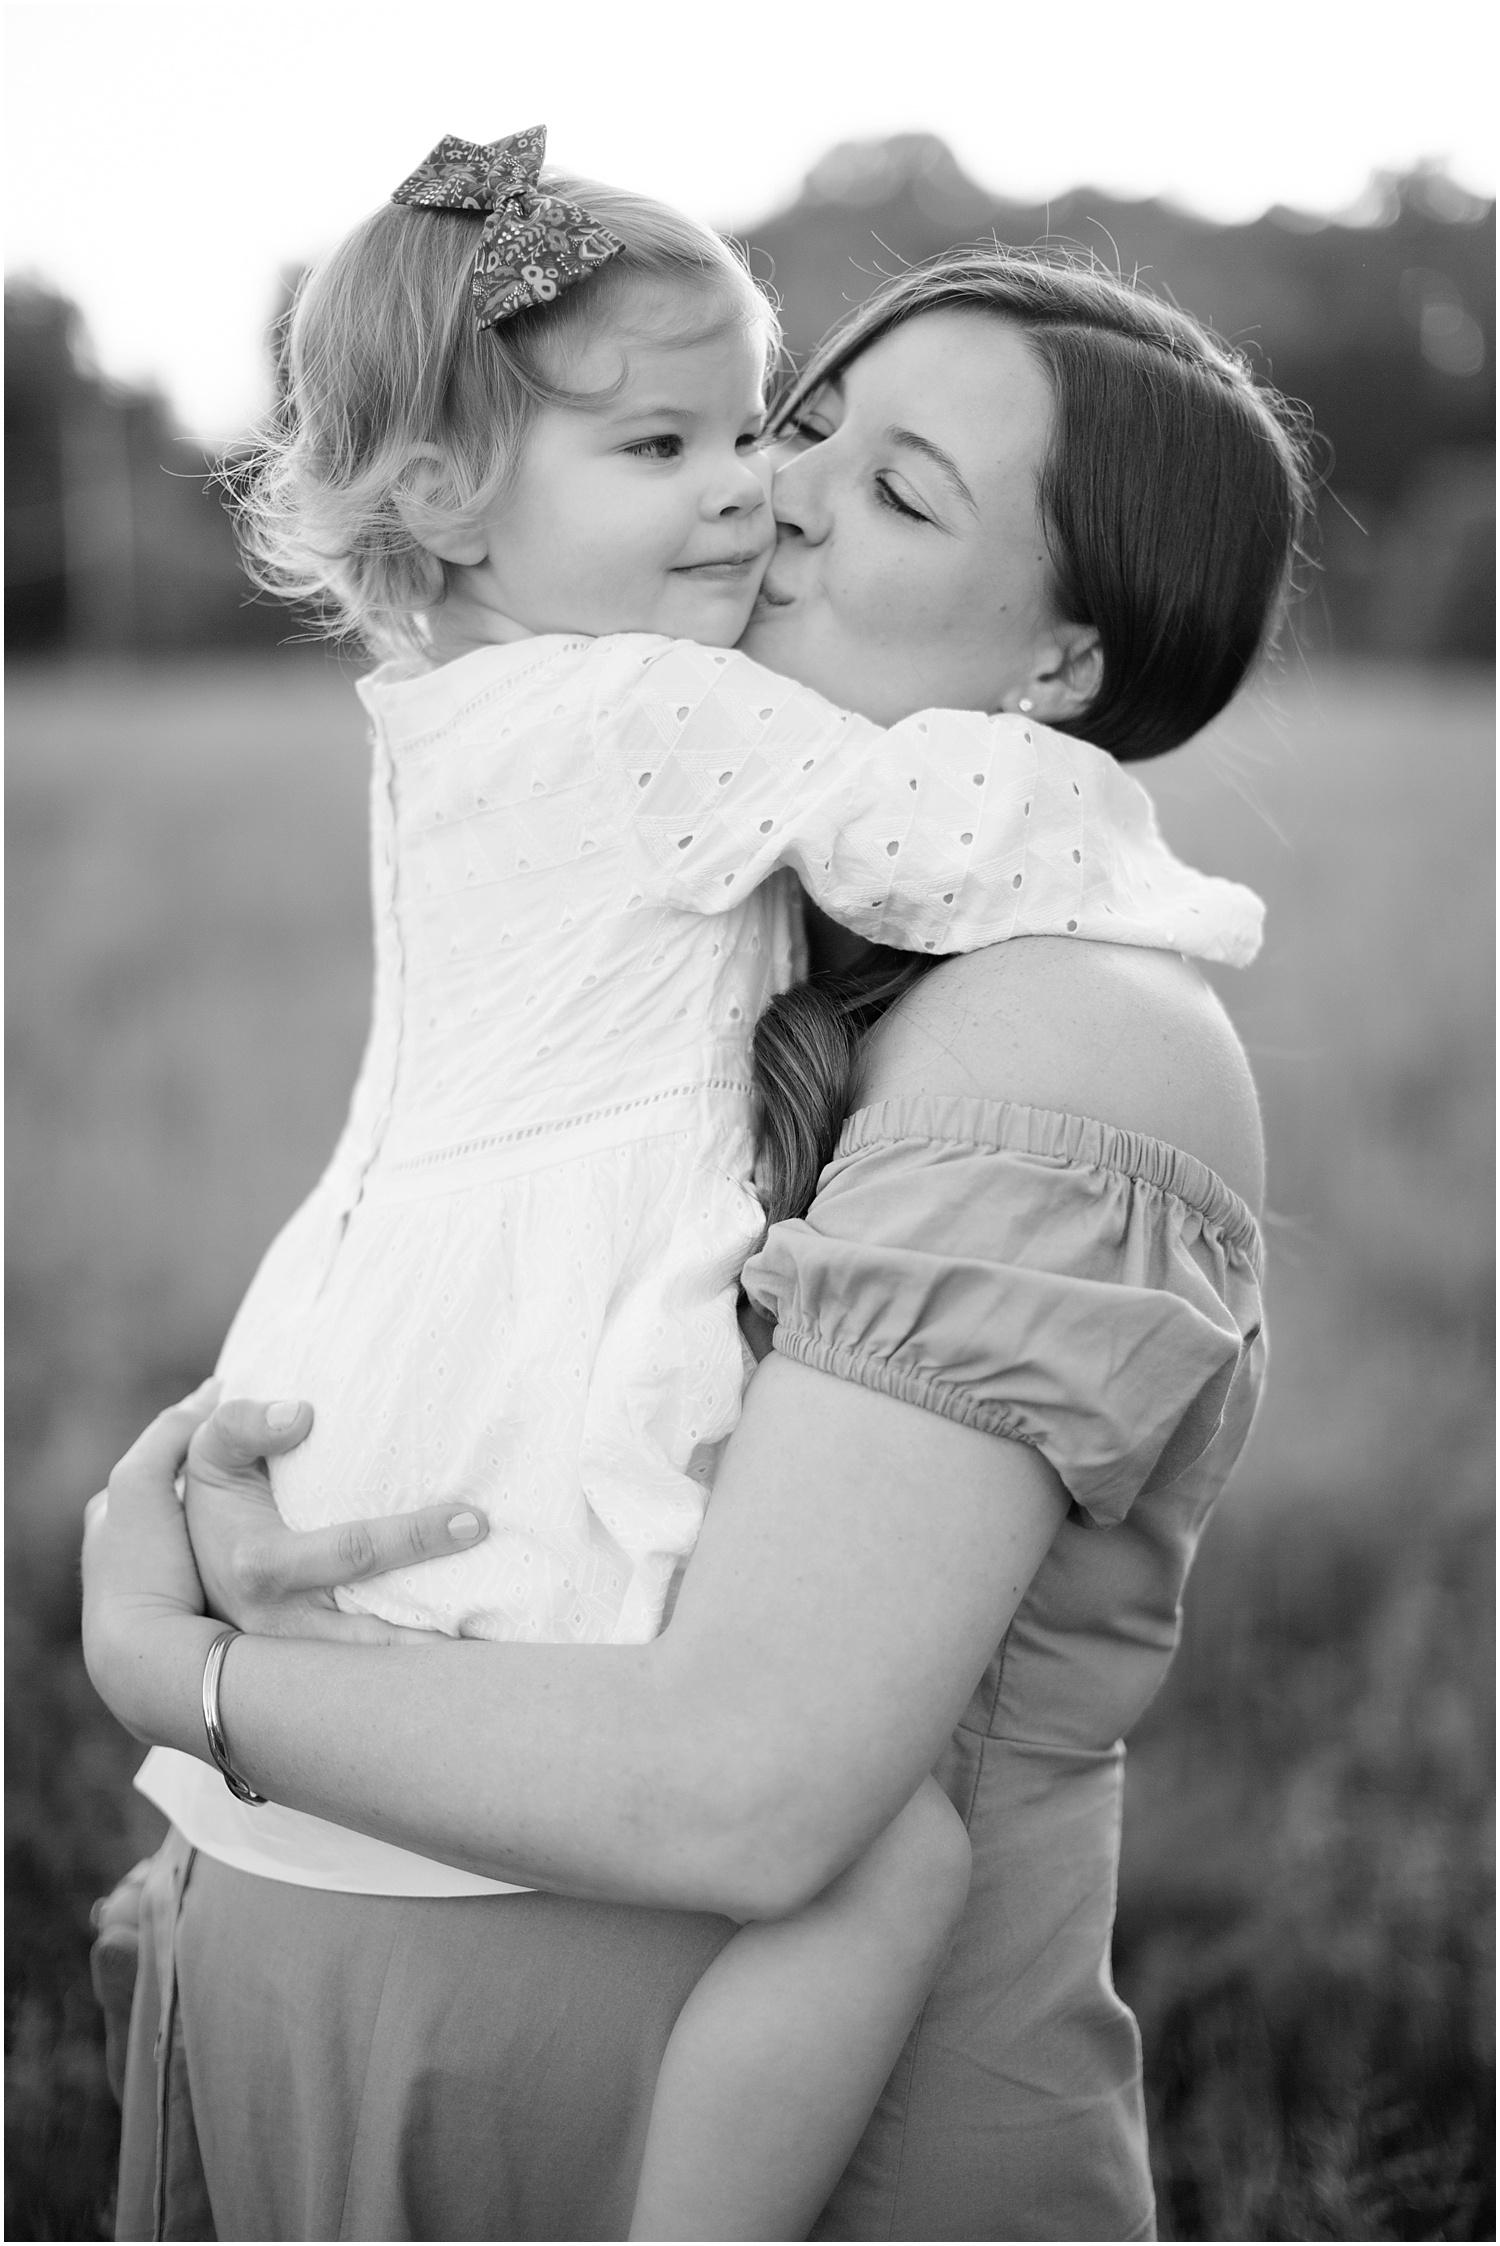 astleigh hill maternity session_0008.jpg